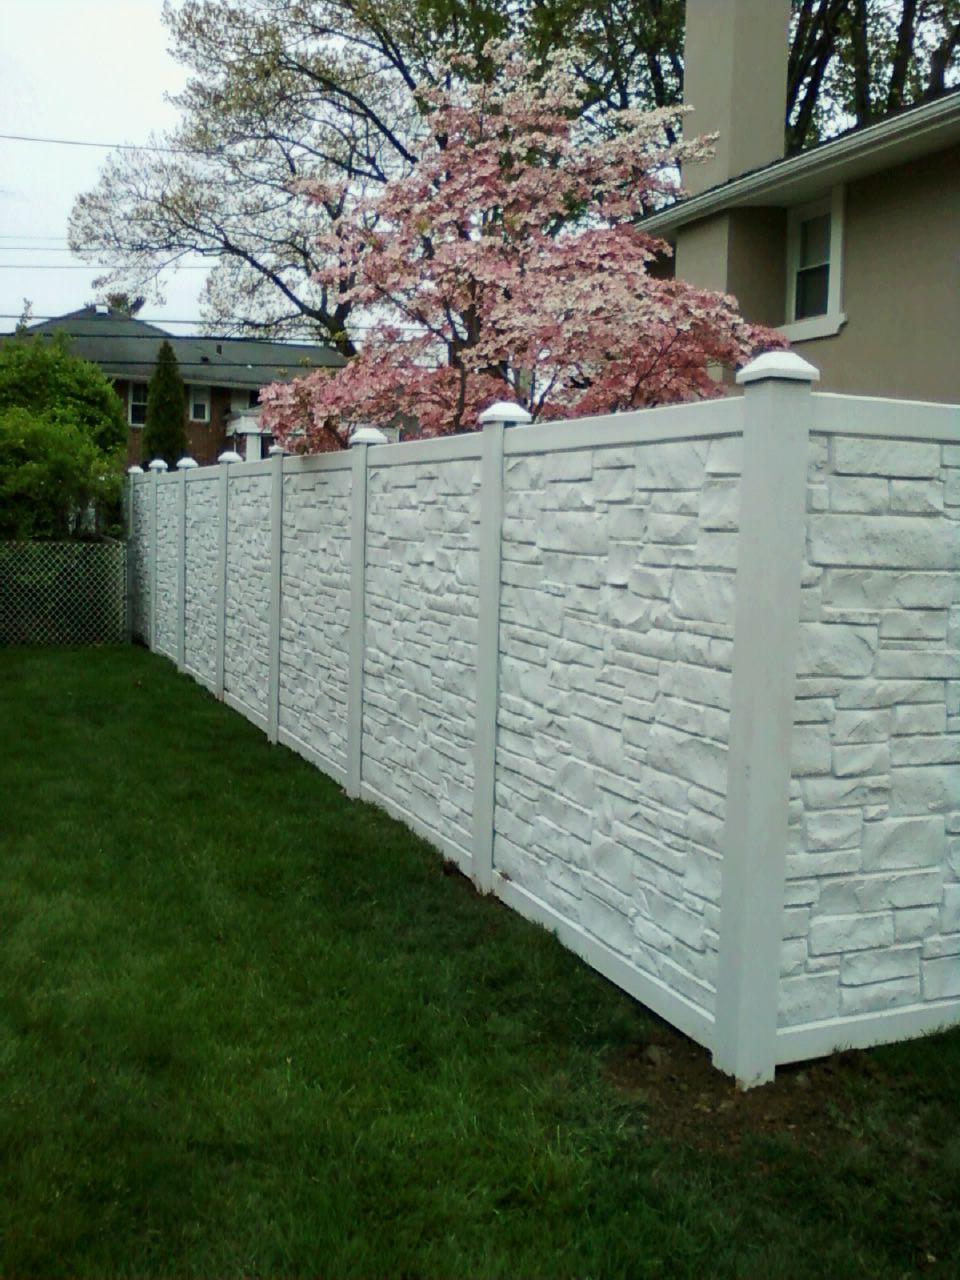 72 White Vinyl Stone Fence Installed In Westbury Ny By Liberty Fence Railing Backyard Fence Decor Garden Fence Panels White Garden Fence